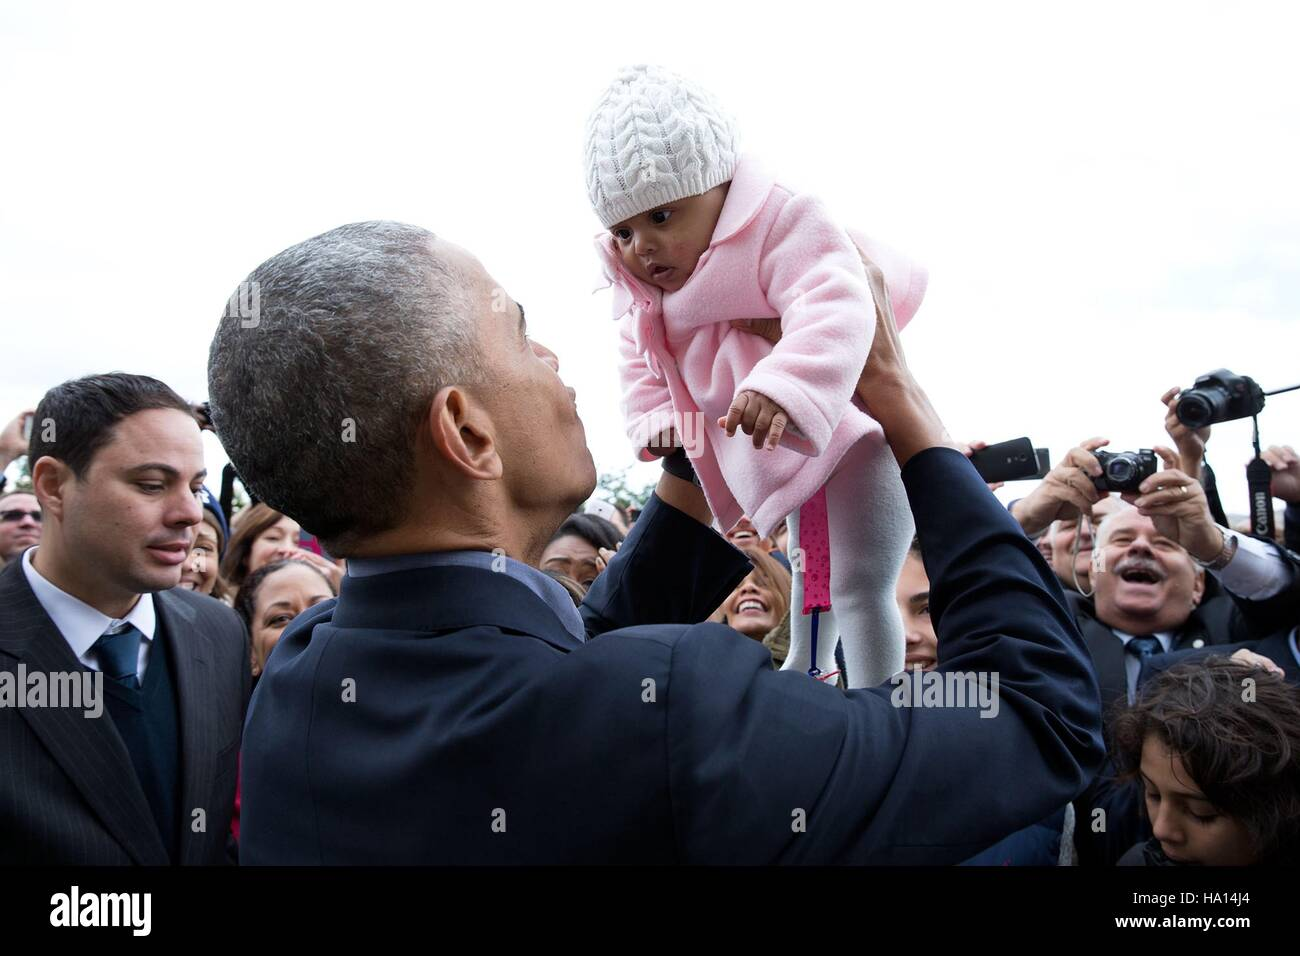 Us president barack obama holds up a baby during a us embassy us president barack obama holds up a baby during a us embassy meet and greet at the arion resort november 16 2016 in athens greece m4hsunfo